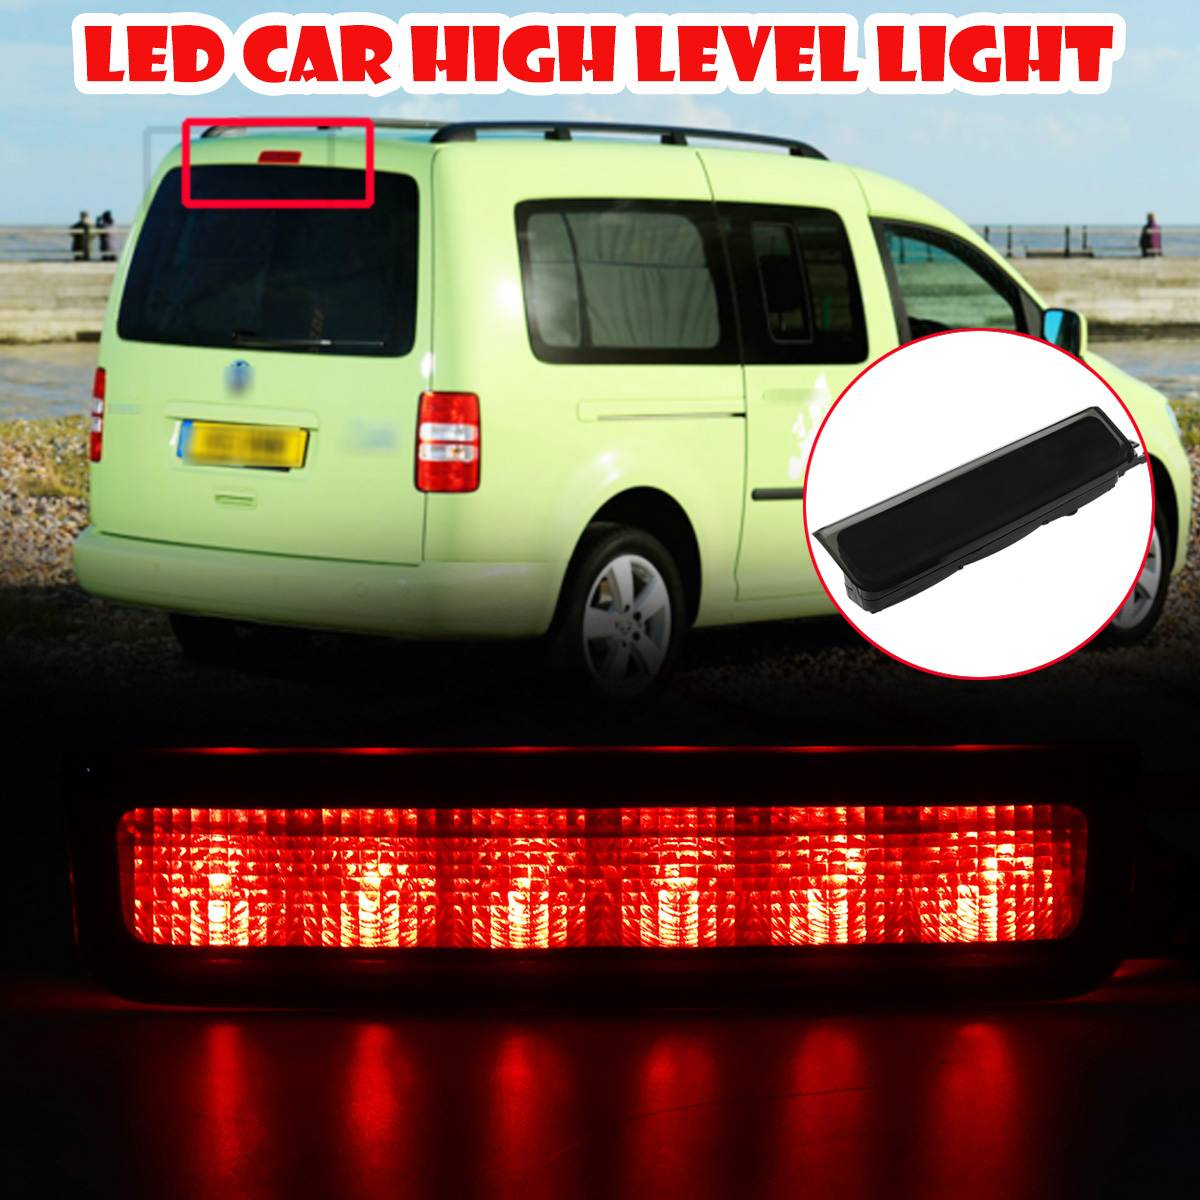 Volkswagen Caddy-High Level Brake Light 3RD Tiers-Genuine VW-Barn ou queue